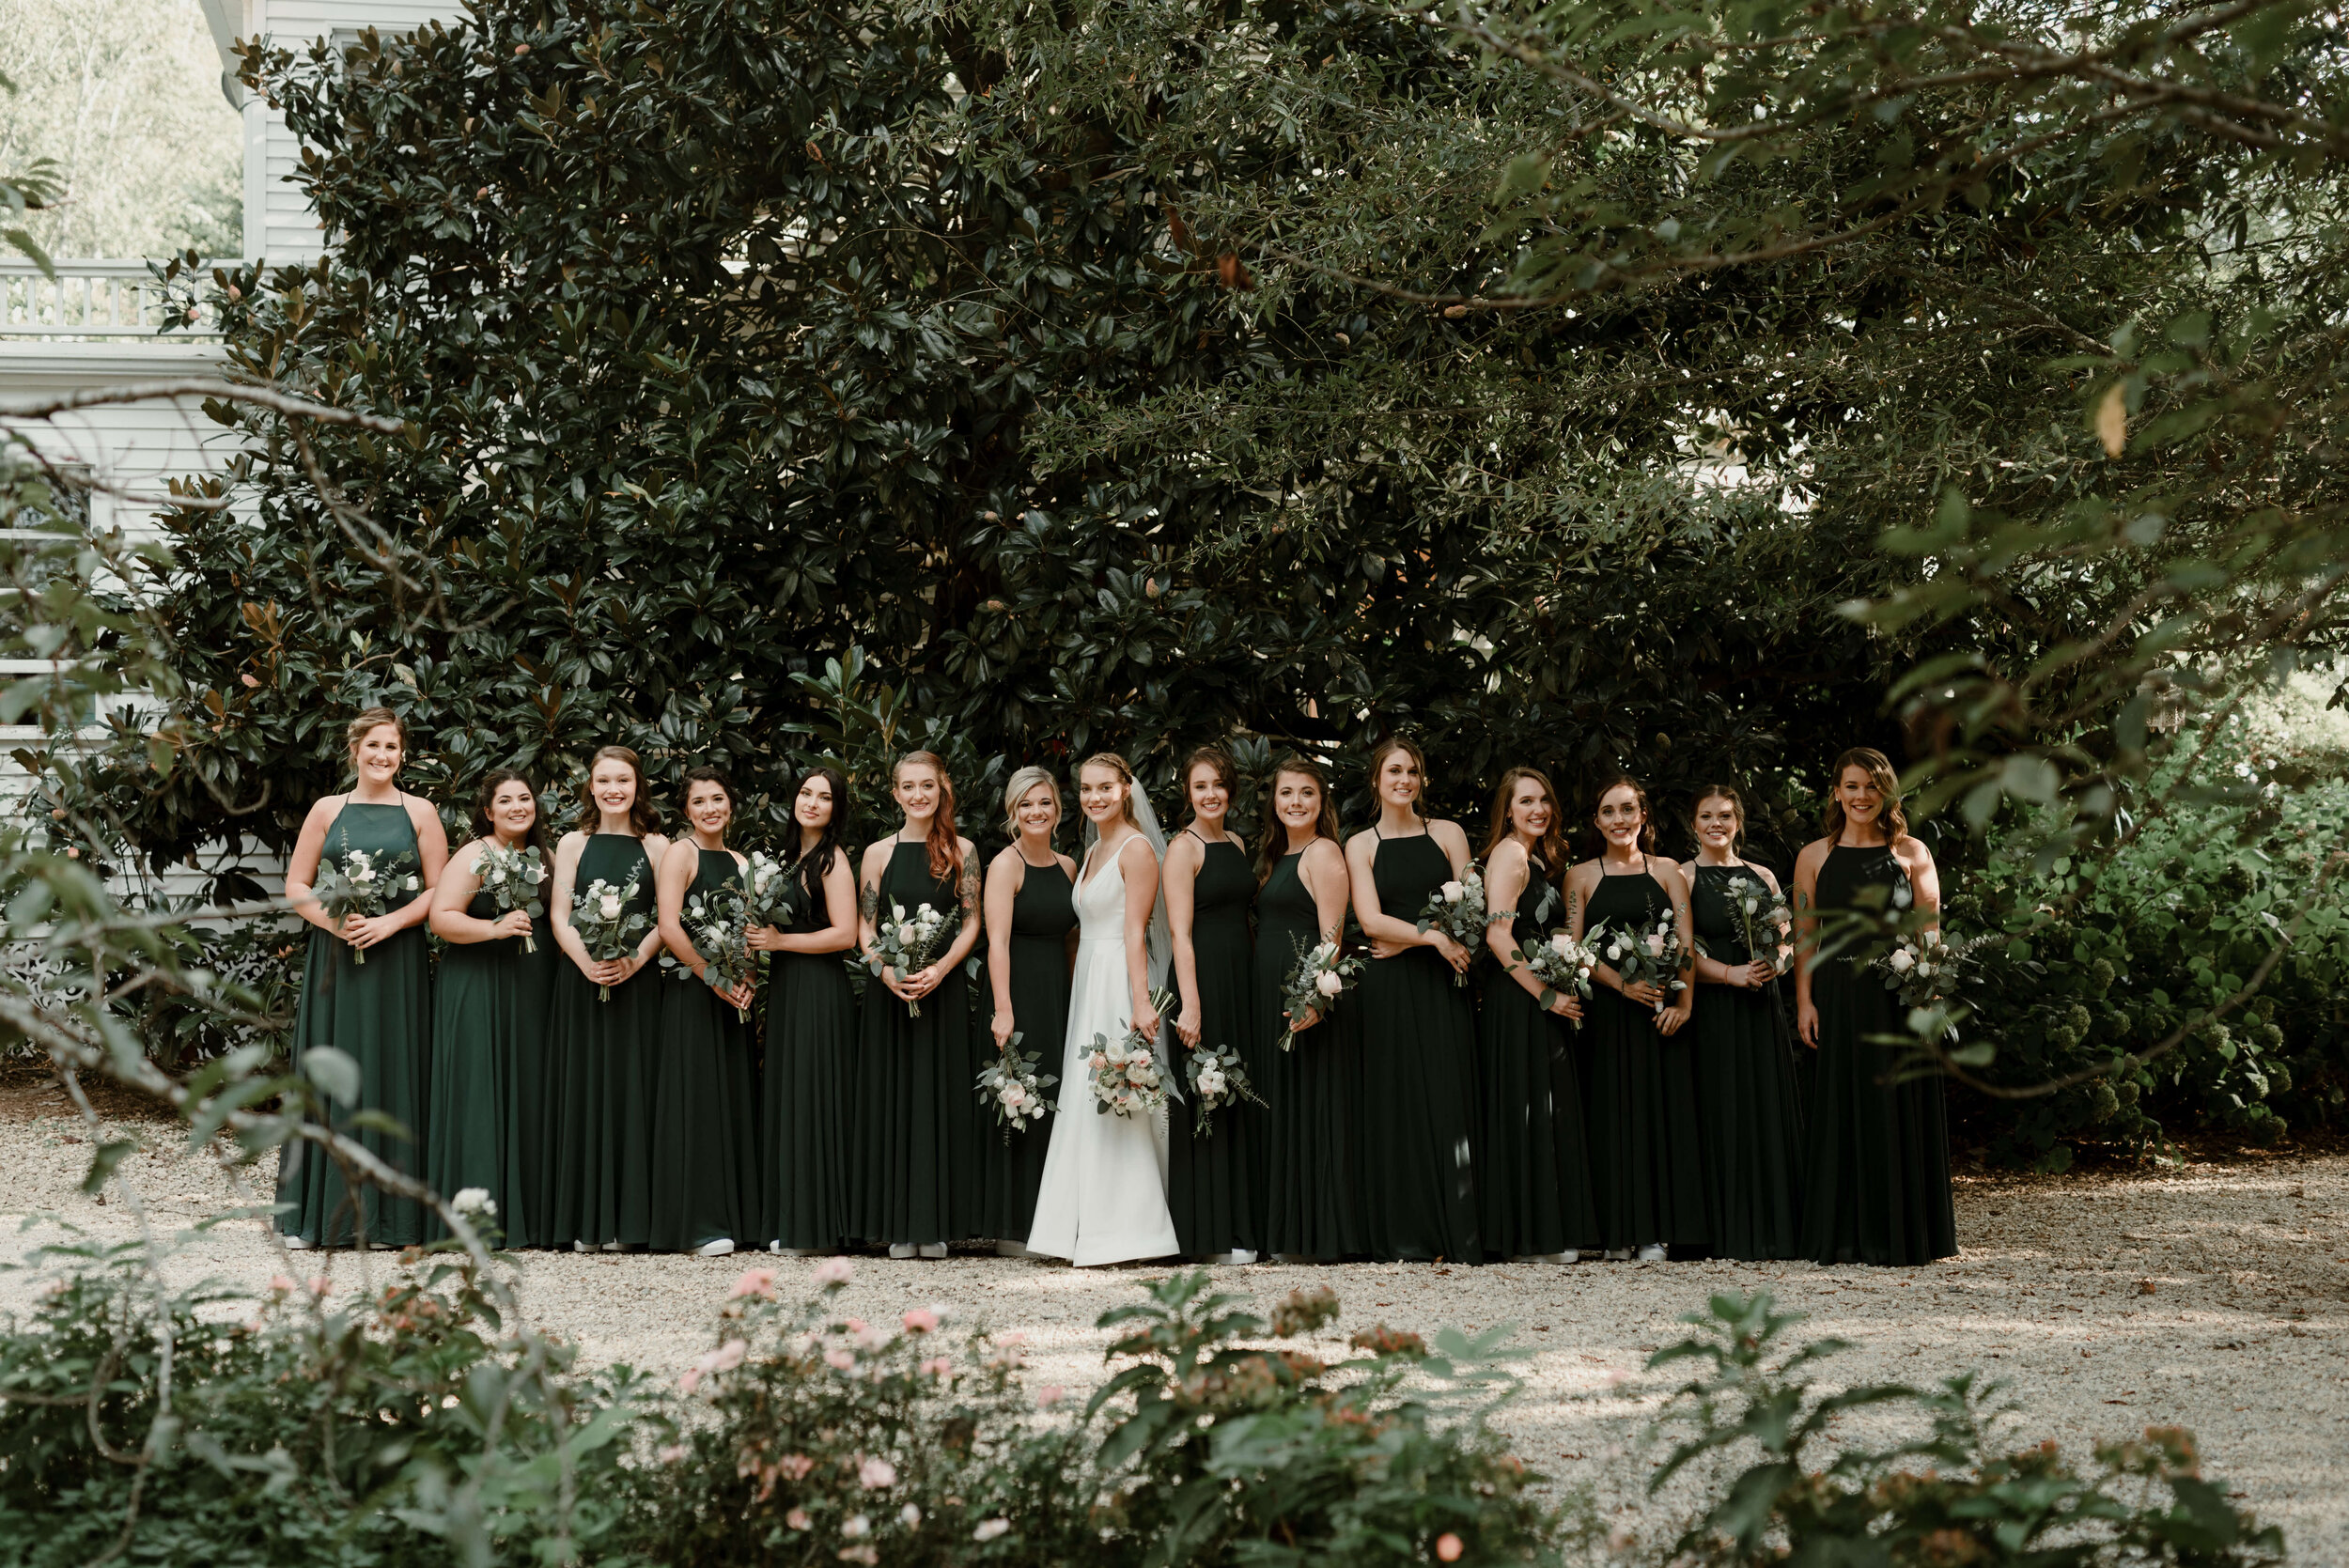 RALEIGH_WEDDING_GABBY_AND_SMITTYDSC_7583.jpg